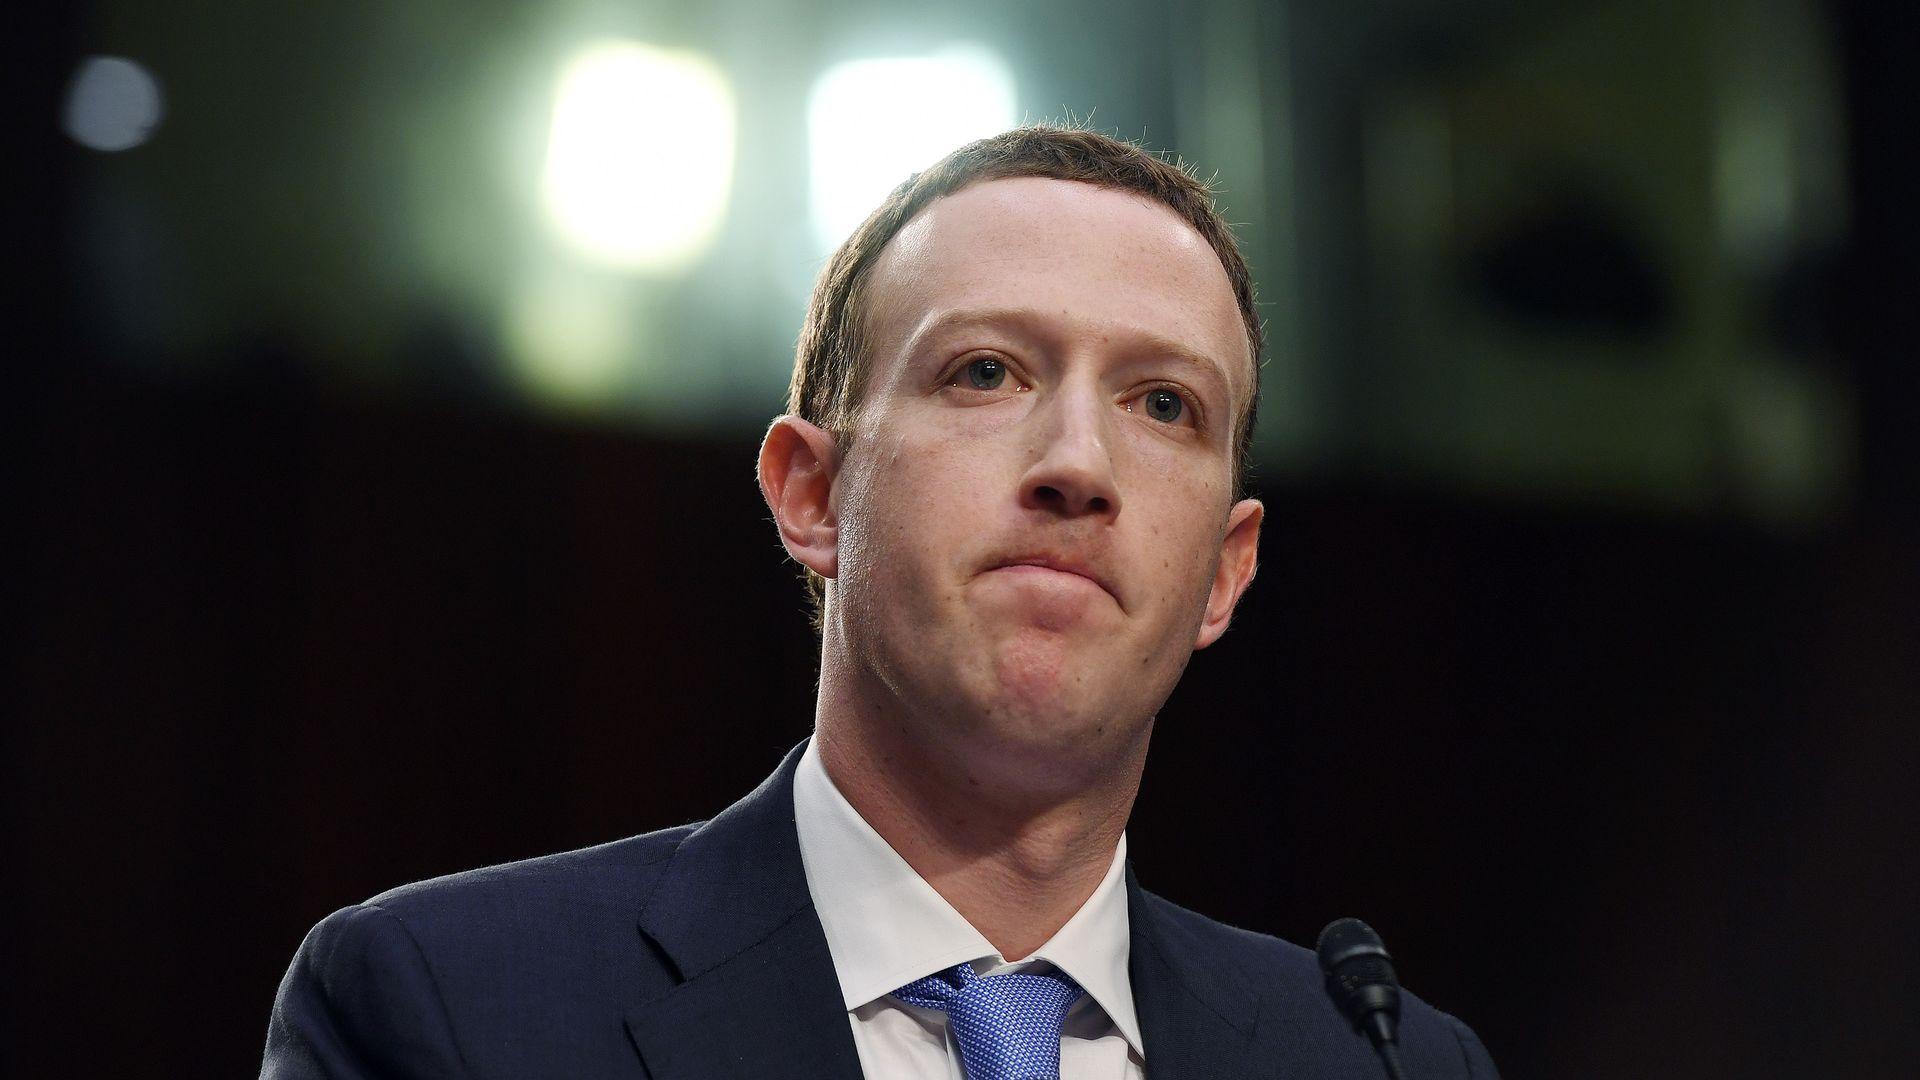 Mark Zuckerberg testifying before Congress